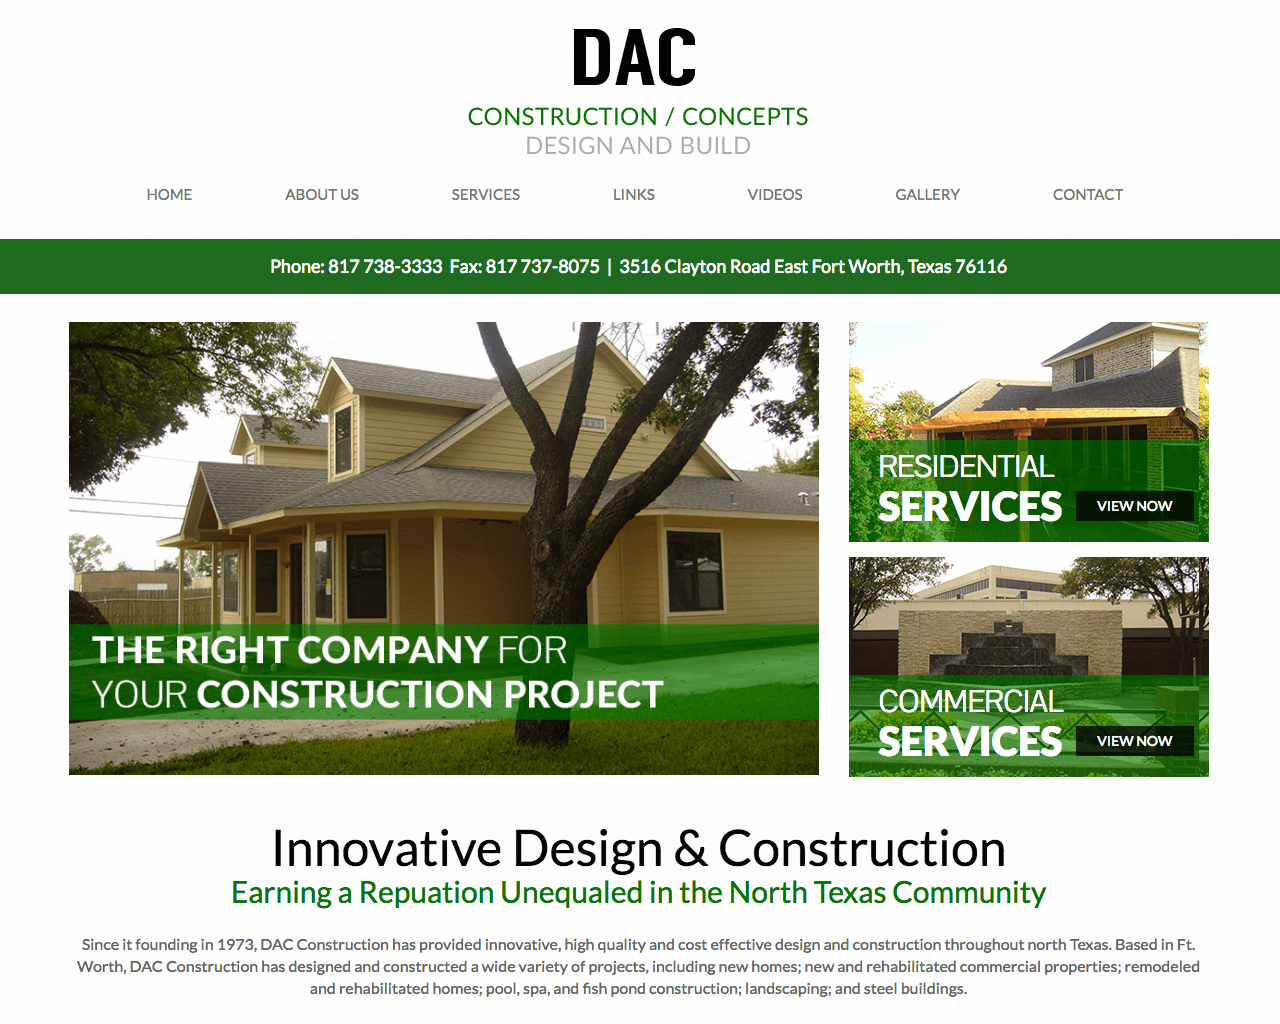 DAC Construction Concepts